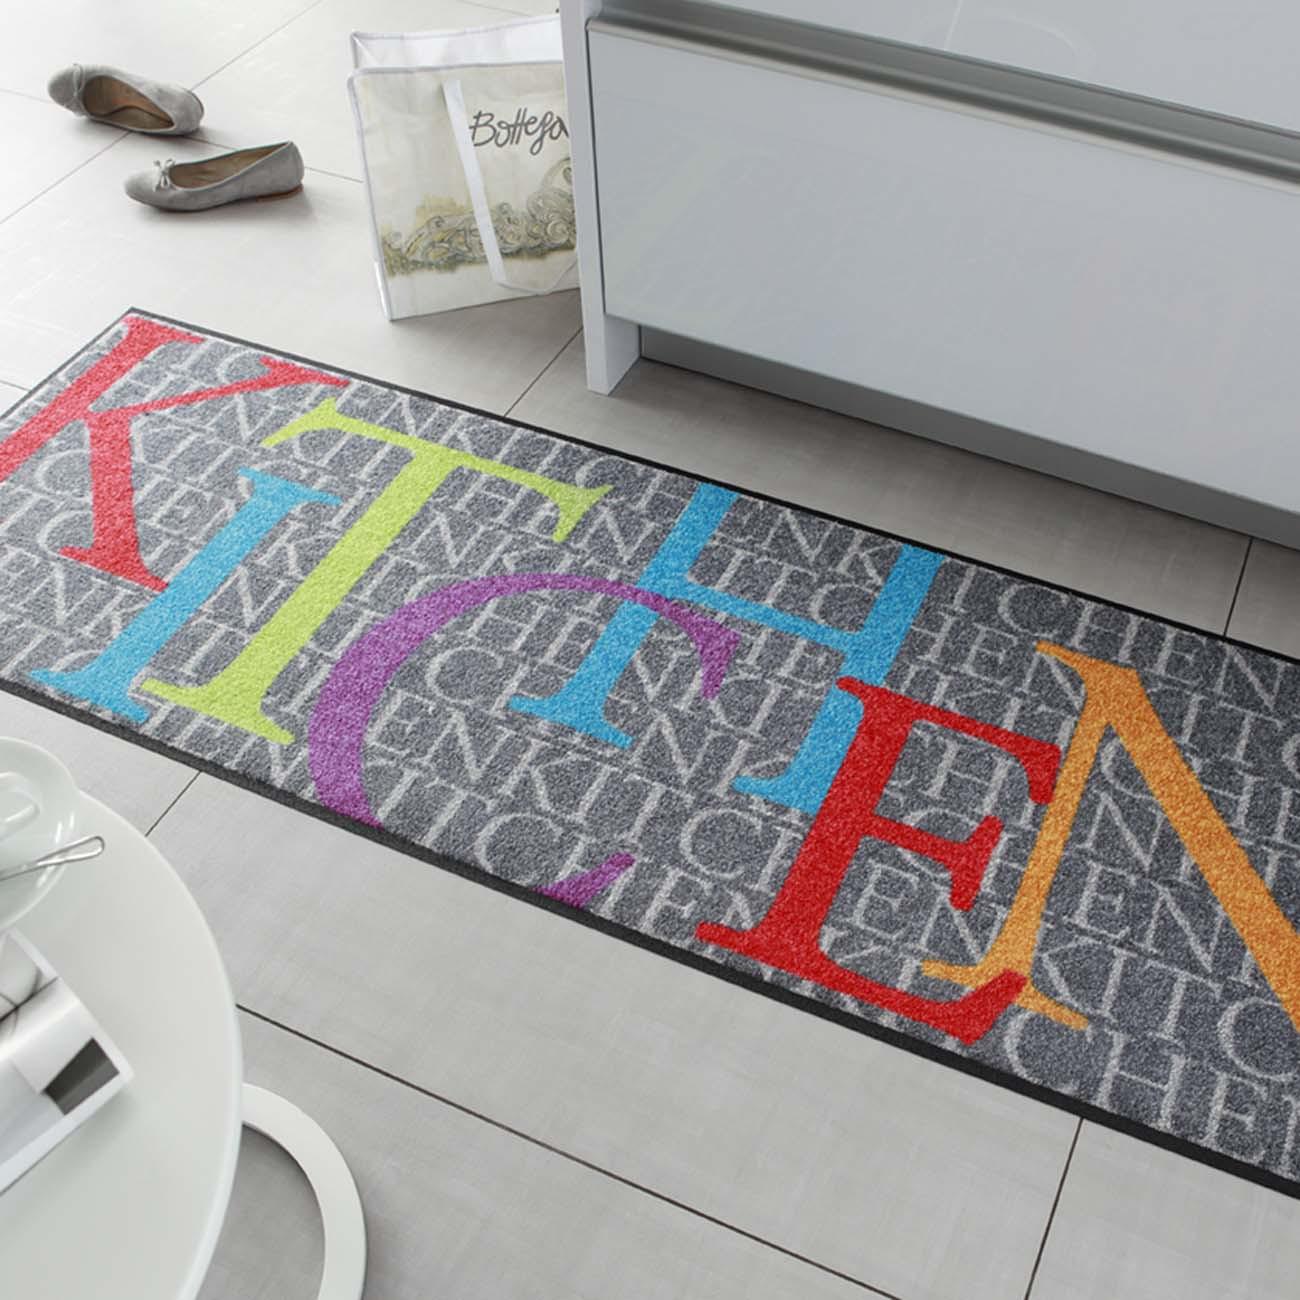 salonloewe fu matte waschbar kitchen news 60x180 cm sld0339 060x180 eingang garten fu matten. Black Bedroom Furniture Sets. Home Design Ideas